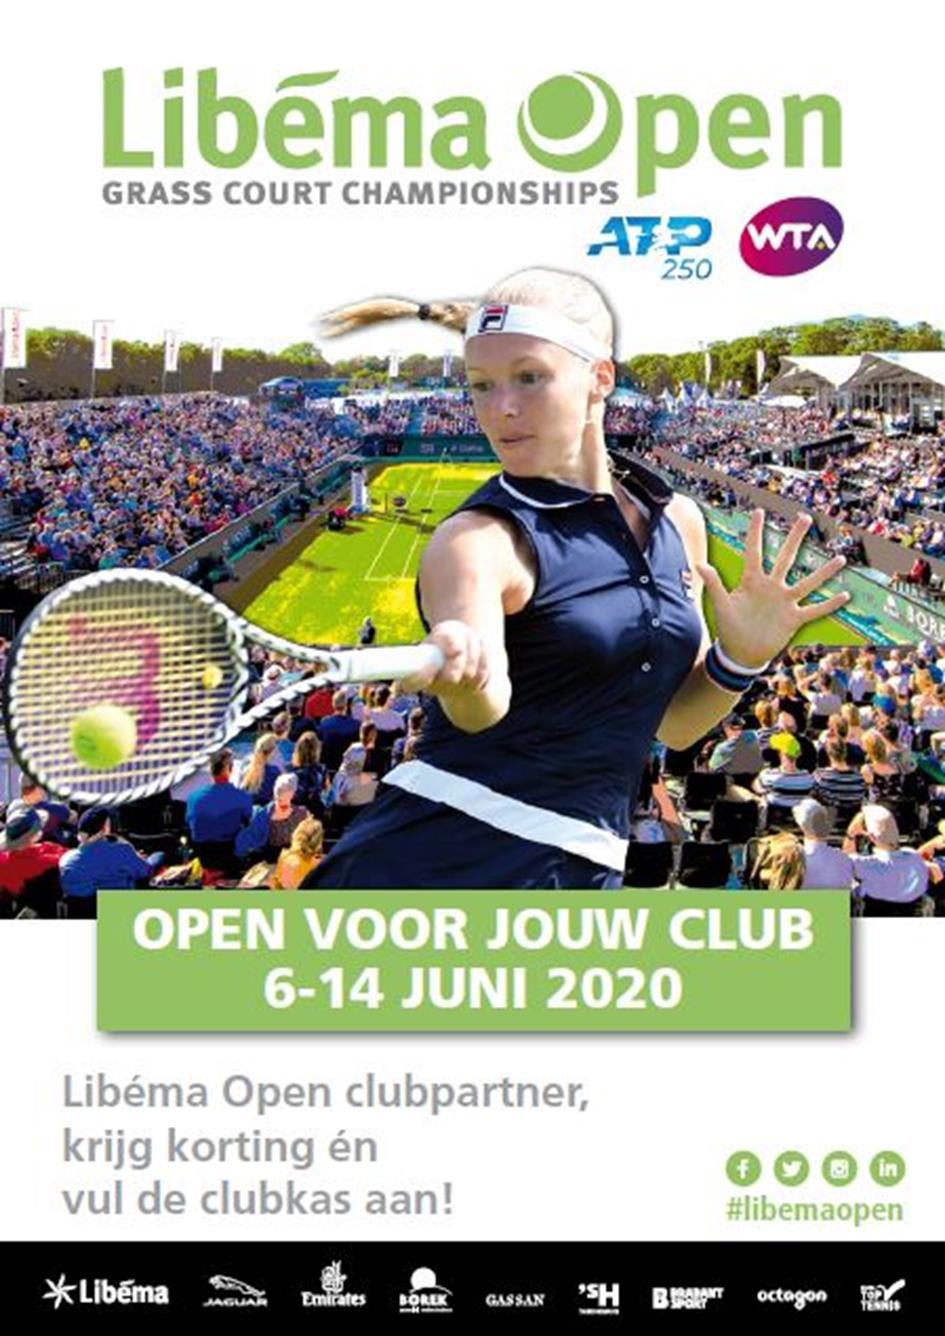 Libema open 1.JPG